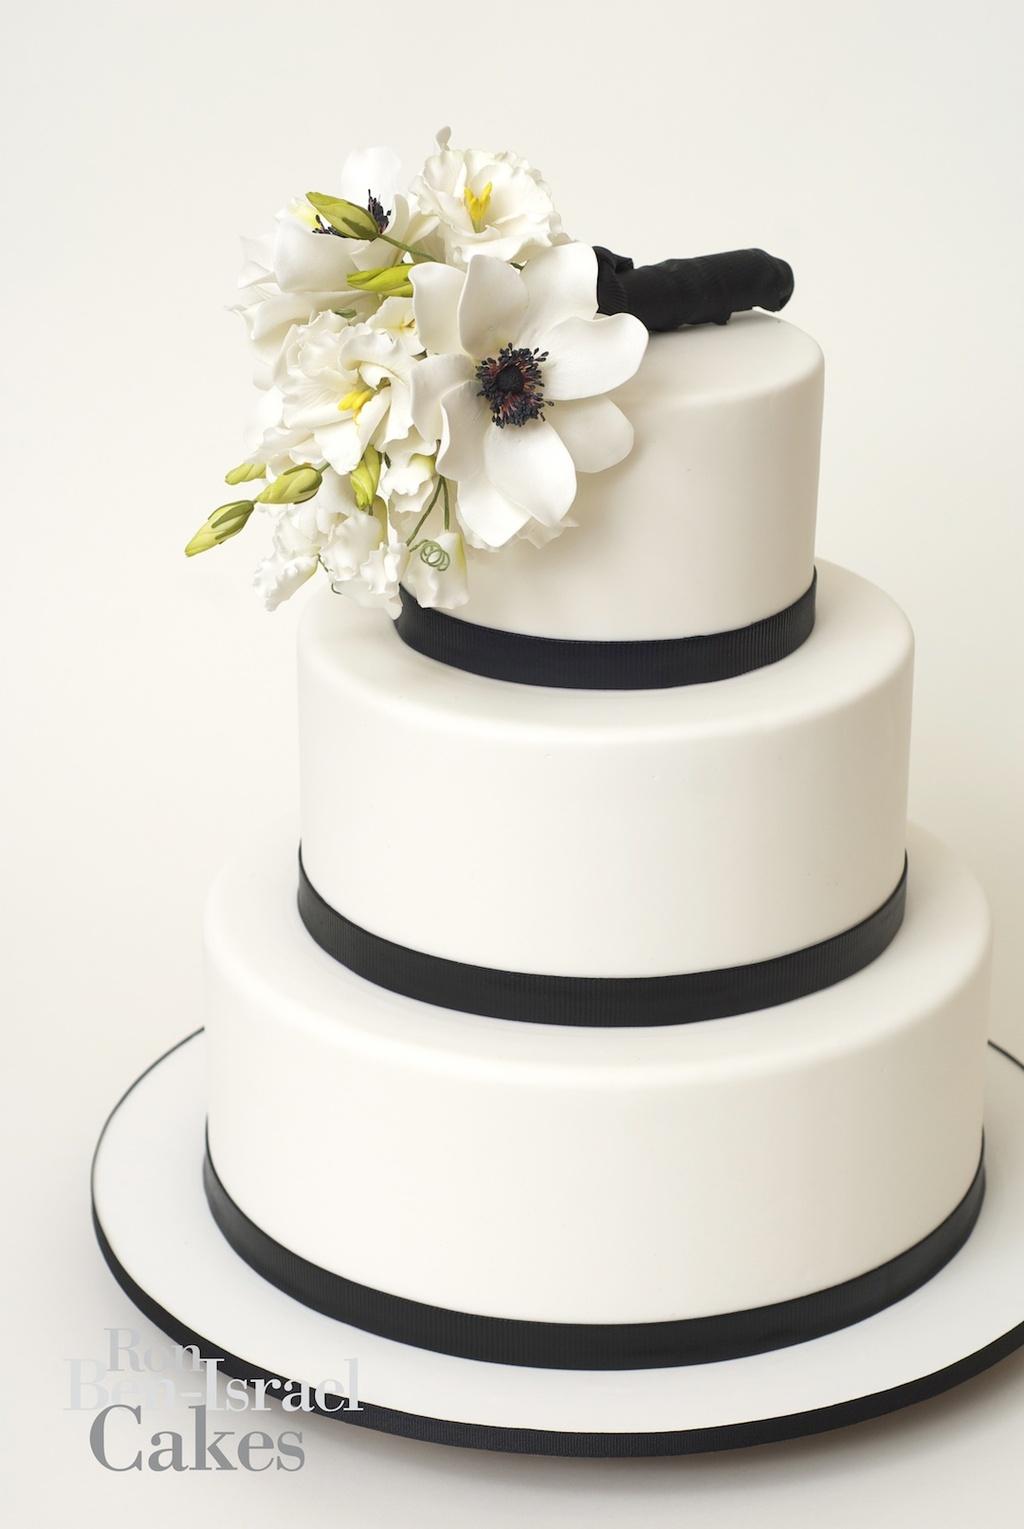 Wedding-cake-inspiration-ron-ben-isreal-wedding-cakes-white-black-classic.full